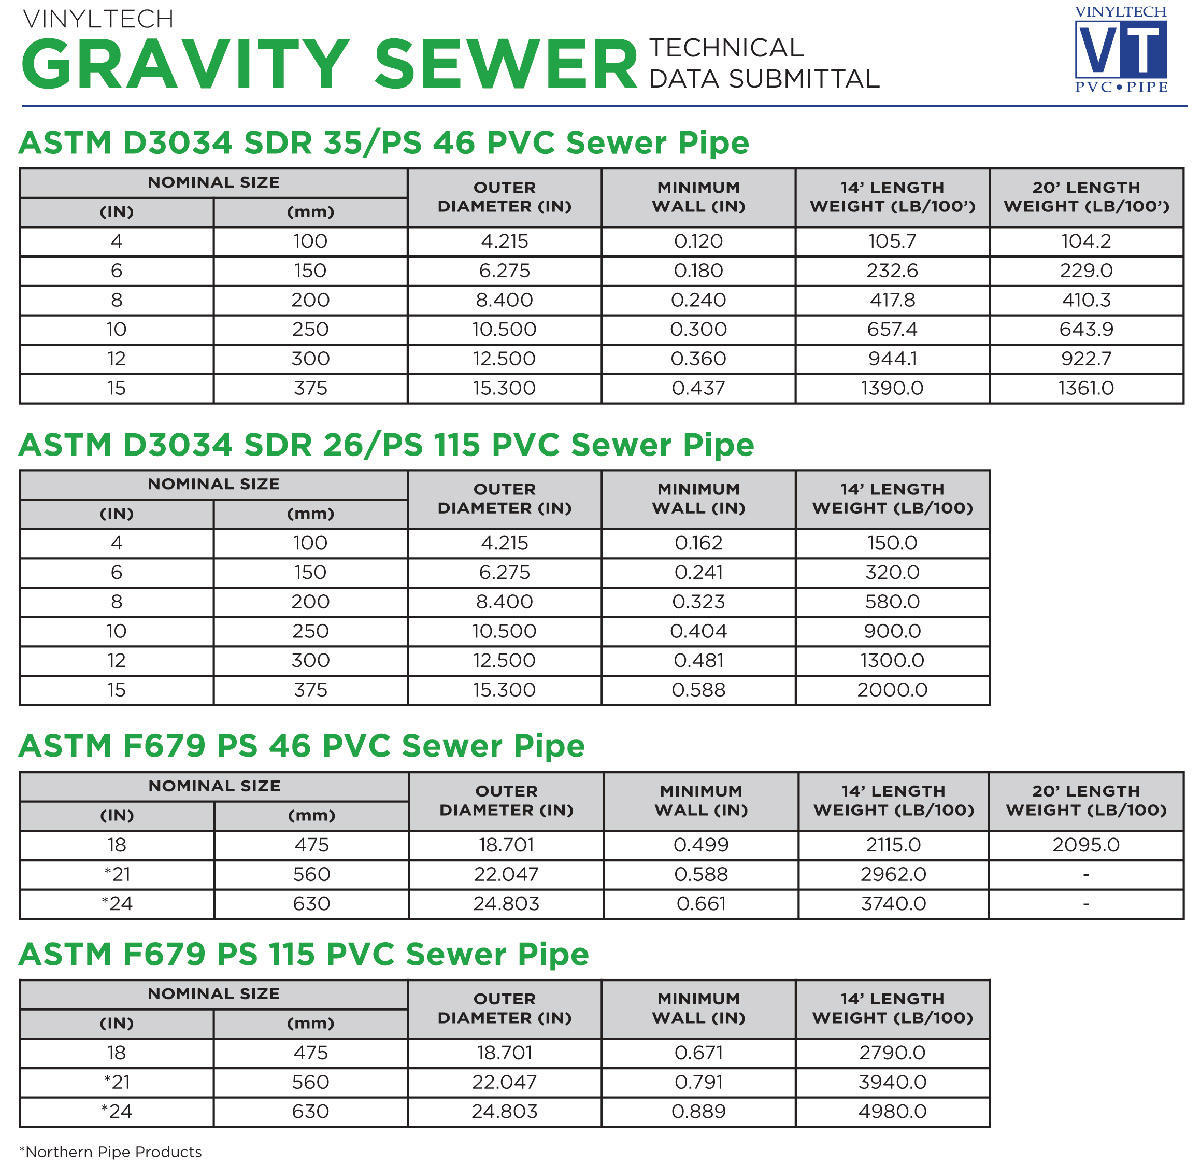 Gravity Sewer Vinyltech Pipe